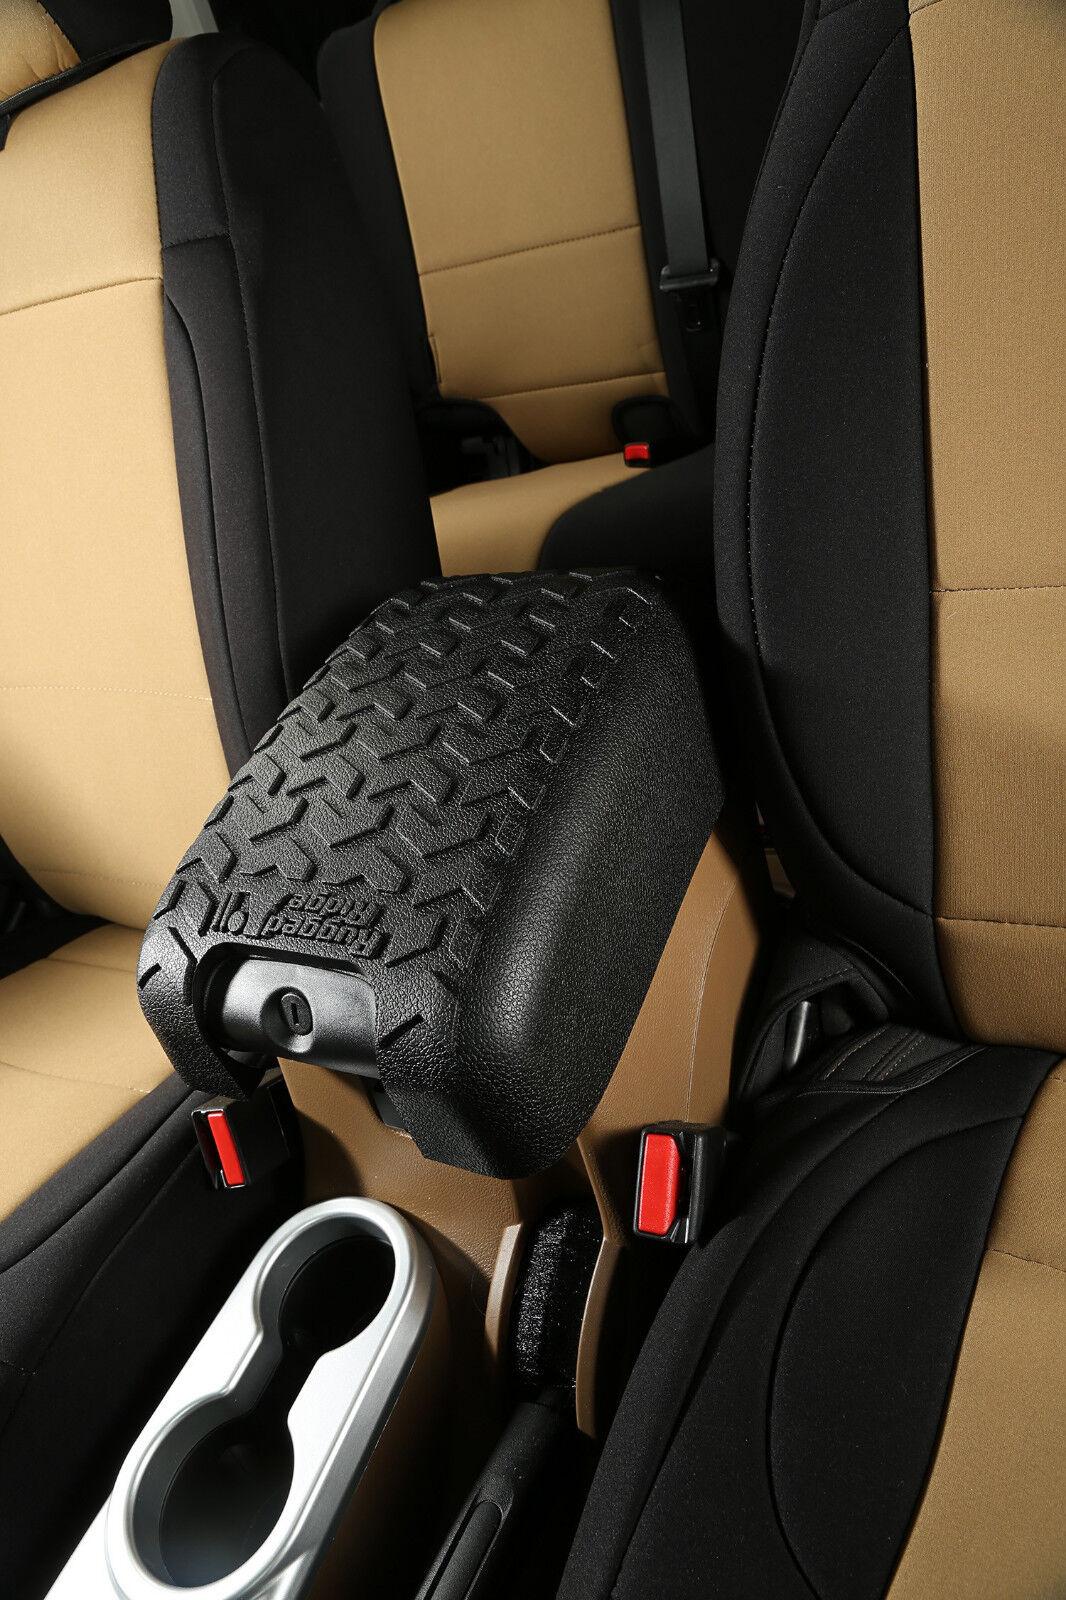 Jeep Rubicon Accessories >> Center Console Arm Rest Cover for Jeep Wrangler JK 2011 ...